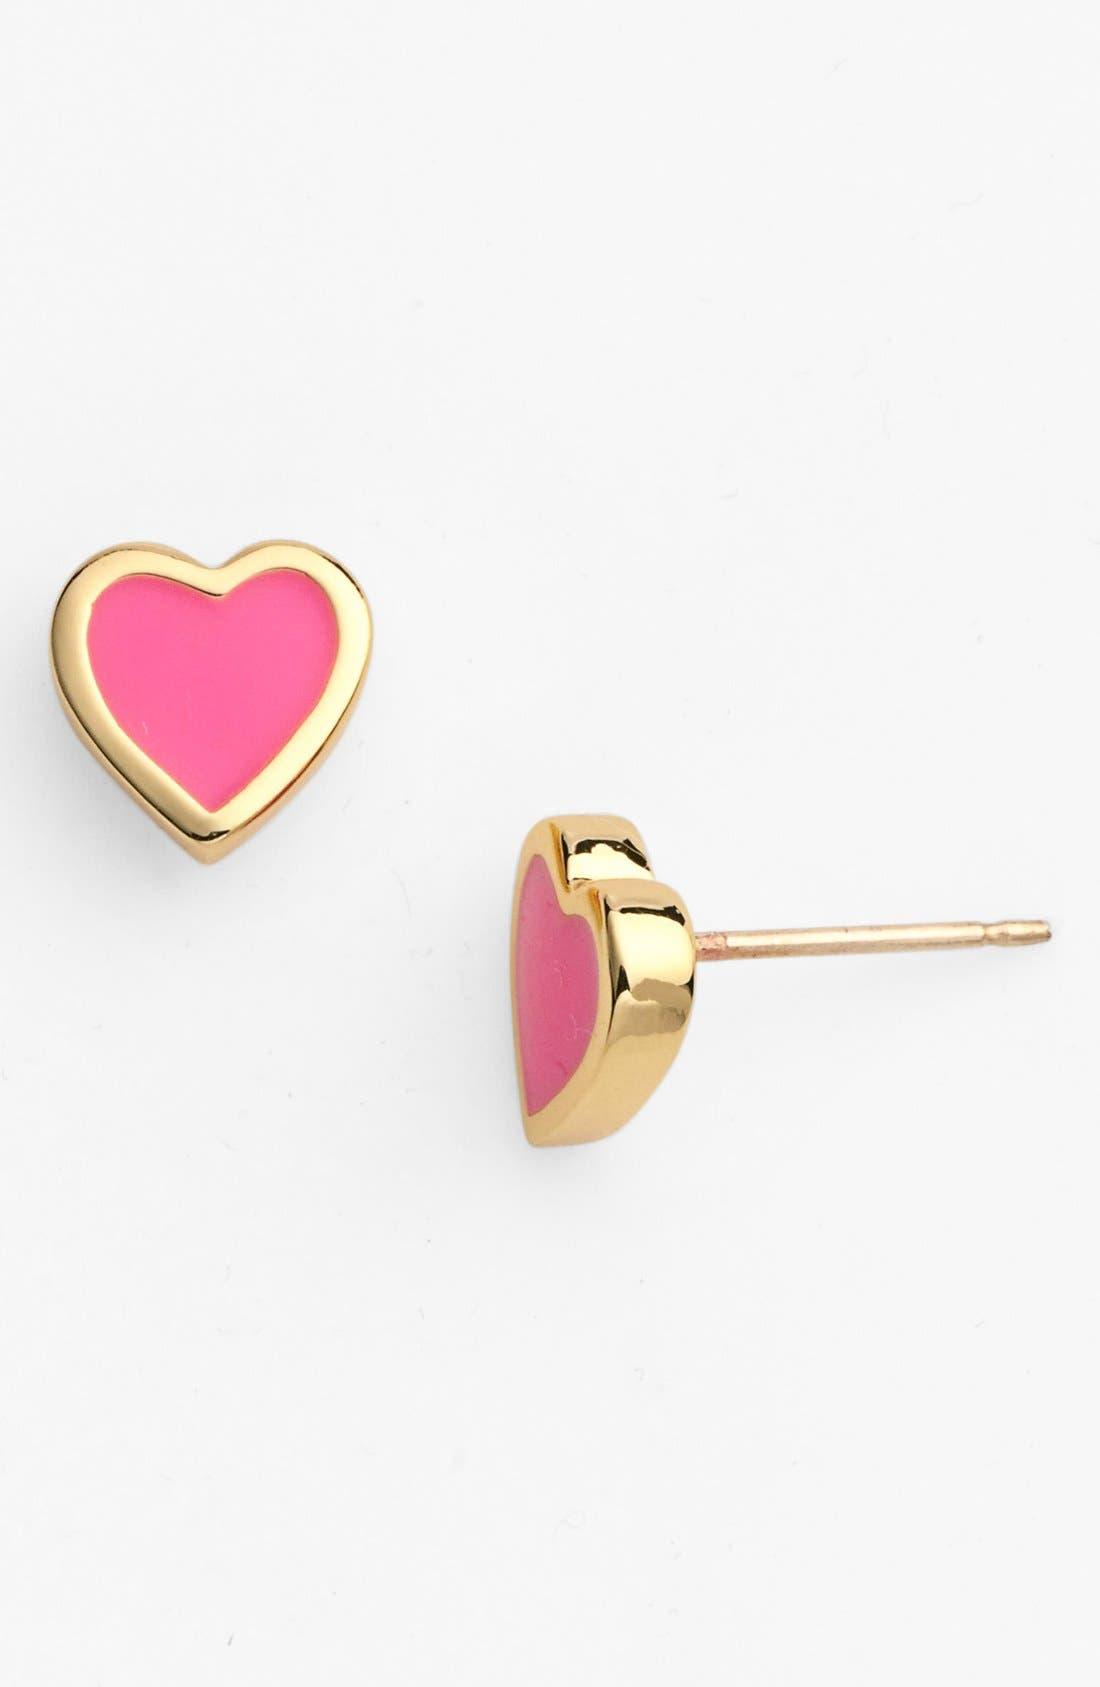 KATE SPADE NEW YORK,                             'be mine' heart stud earrings,                             Main thumbnail 1, color,                             670